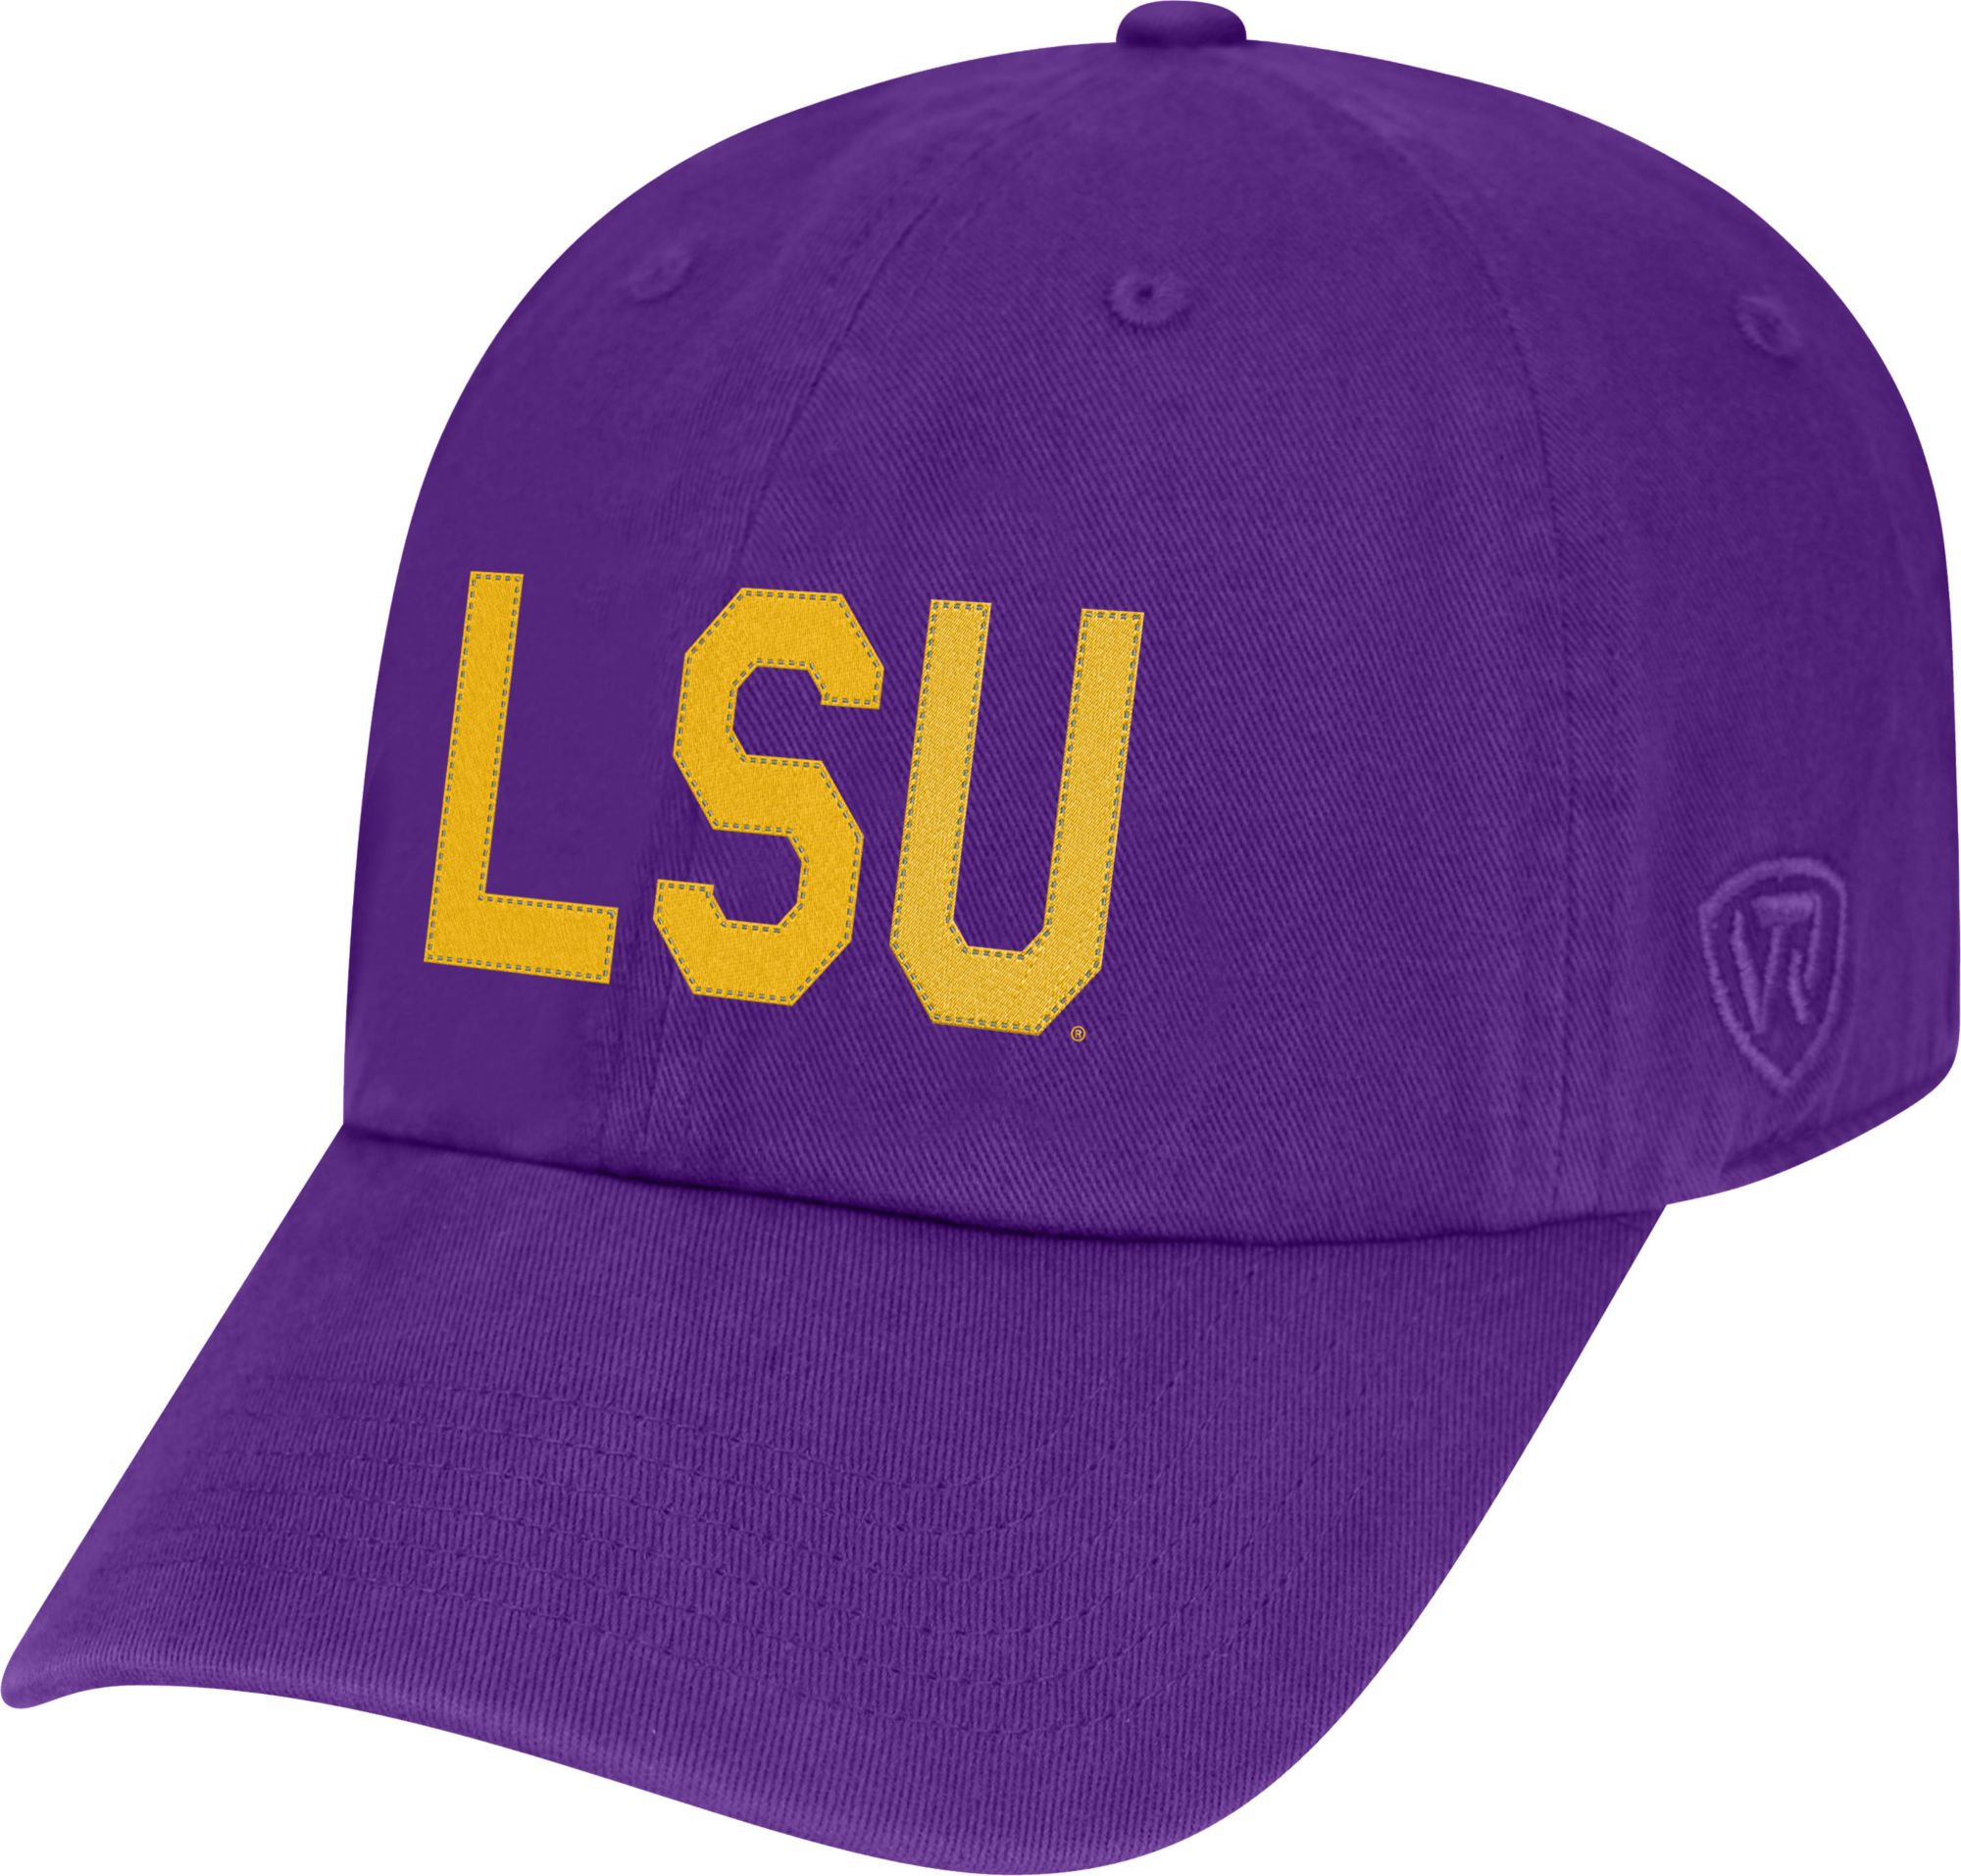 1bf9f3fc5e0898 ... good top of the world mens lsu tigers purple district adjustable hat  2dda7 b7ef9